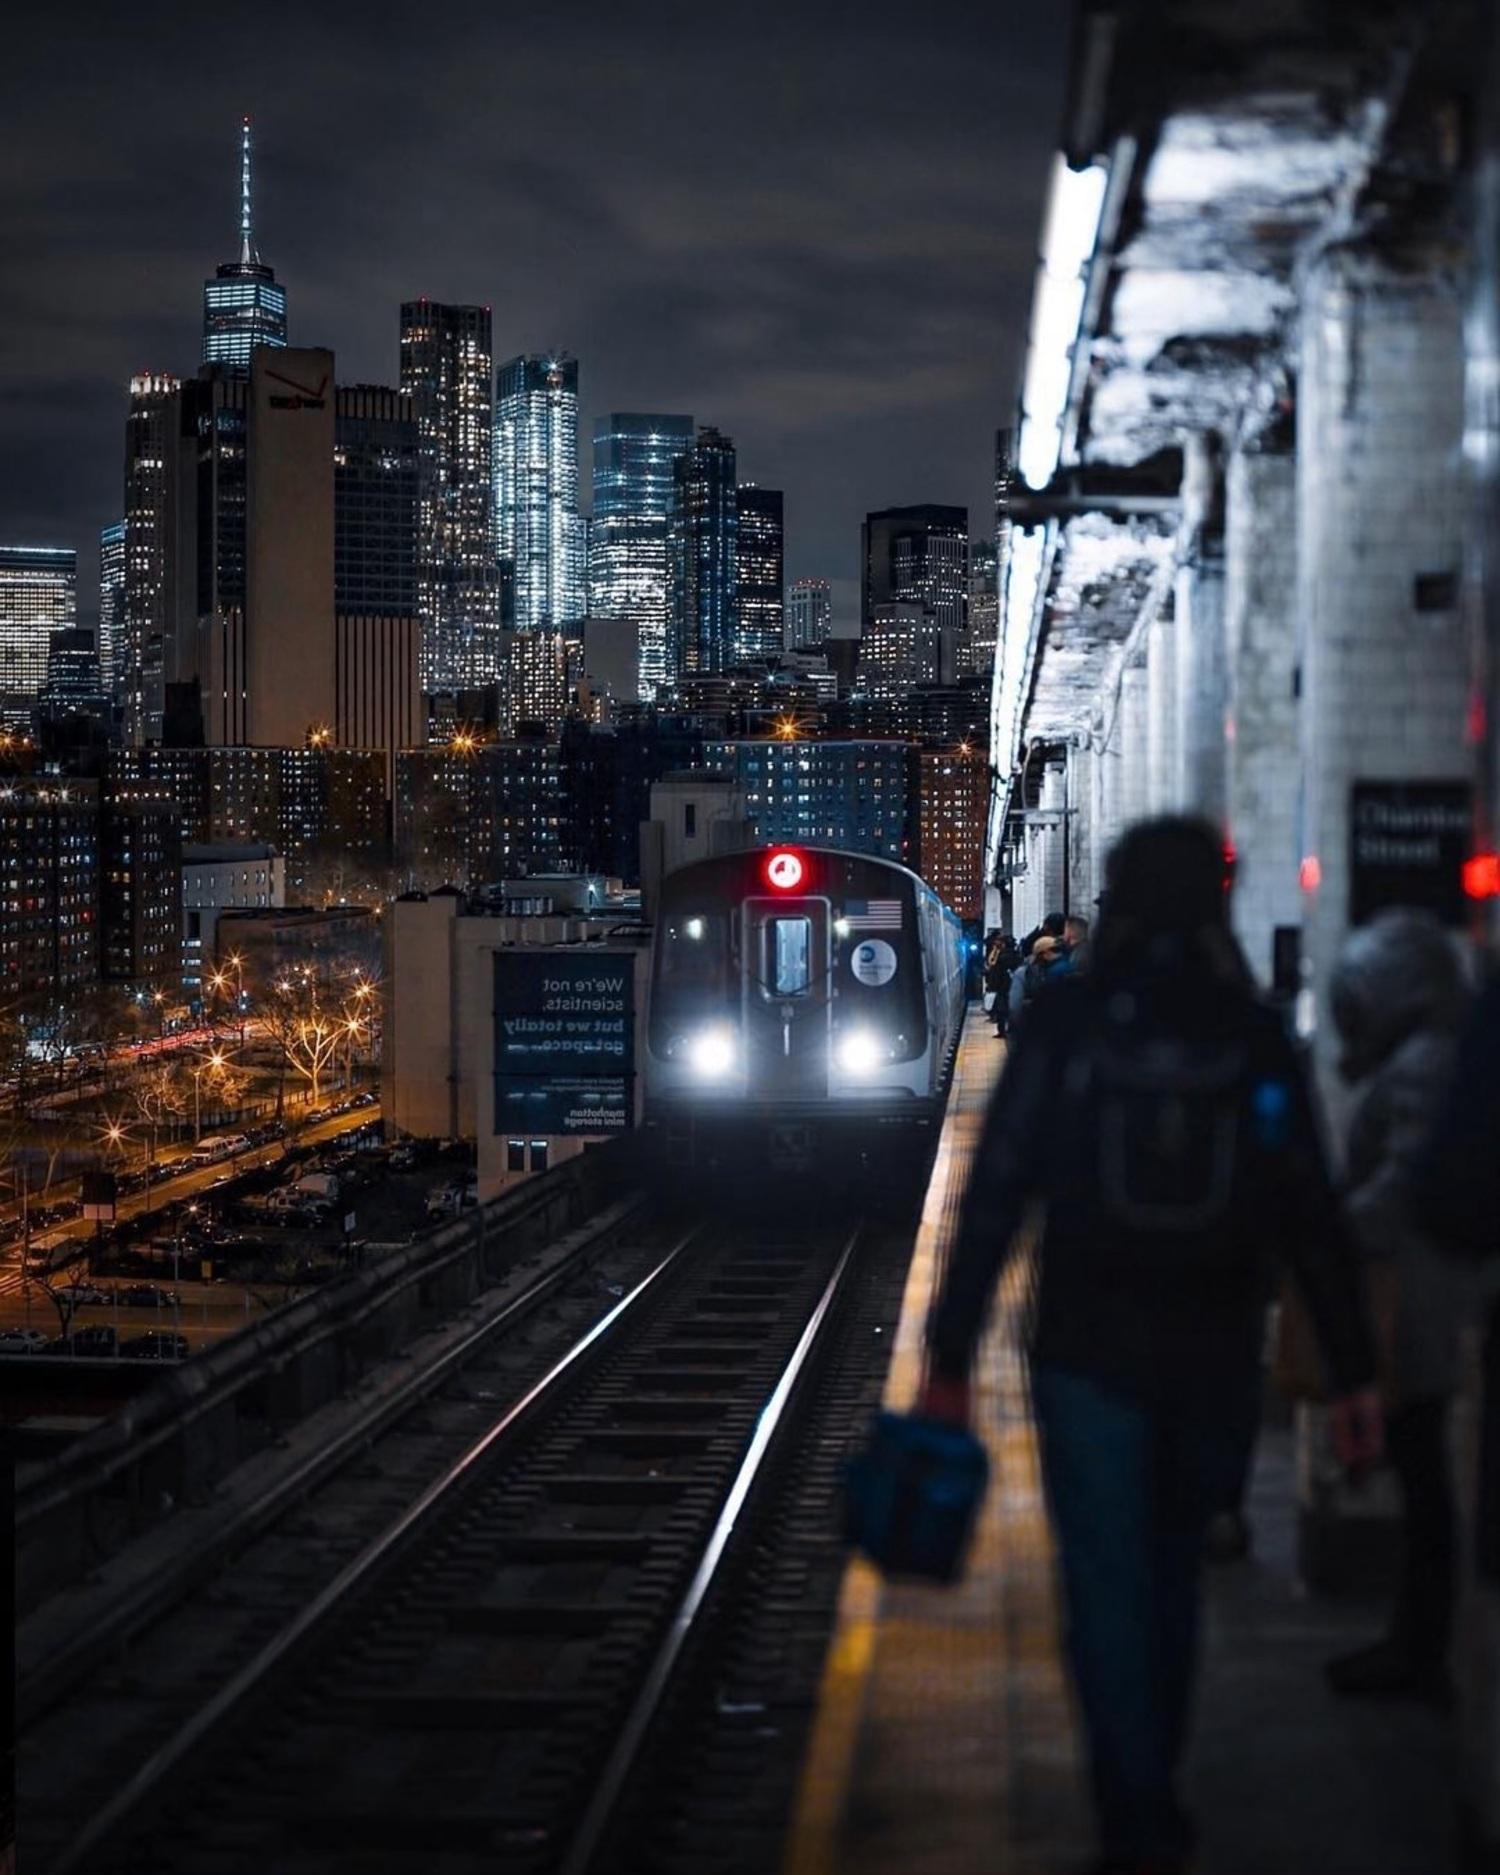 New York, New York. Photo via @raylivez #viewingnyc #nyc #newyork #newyorkcity